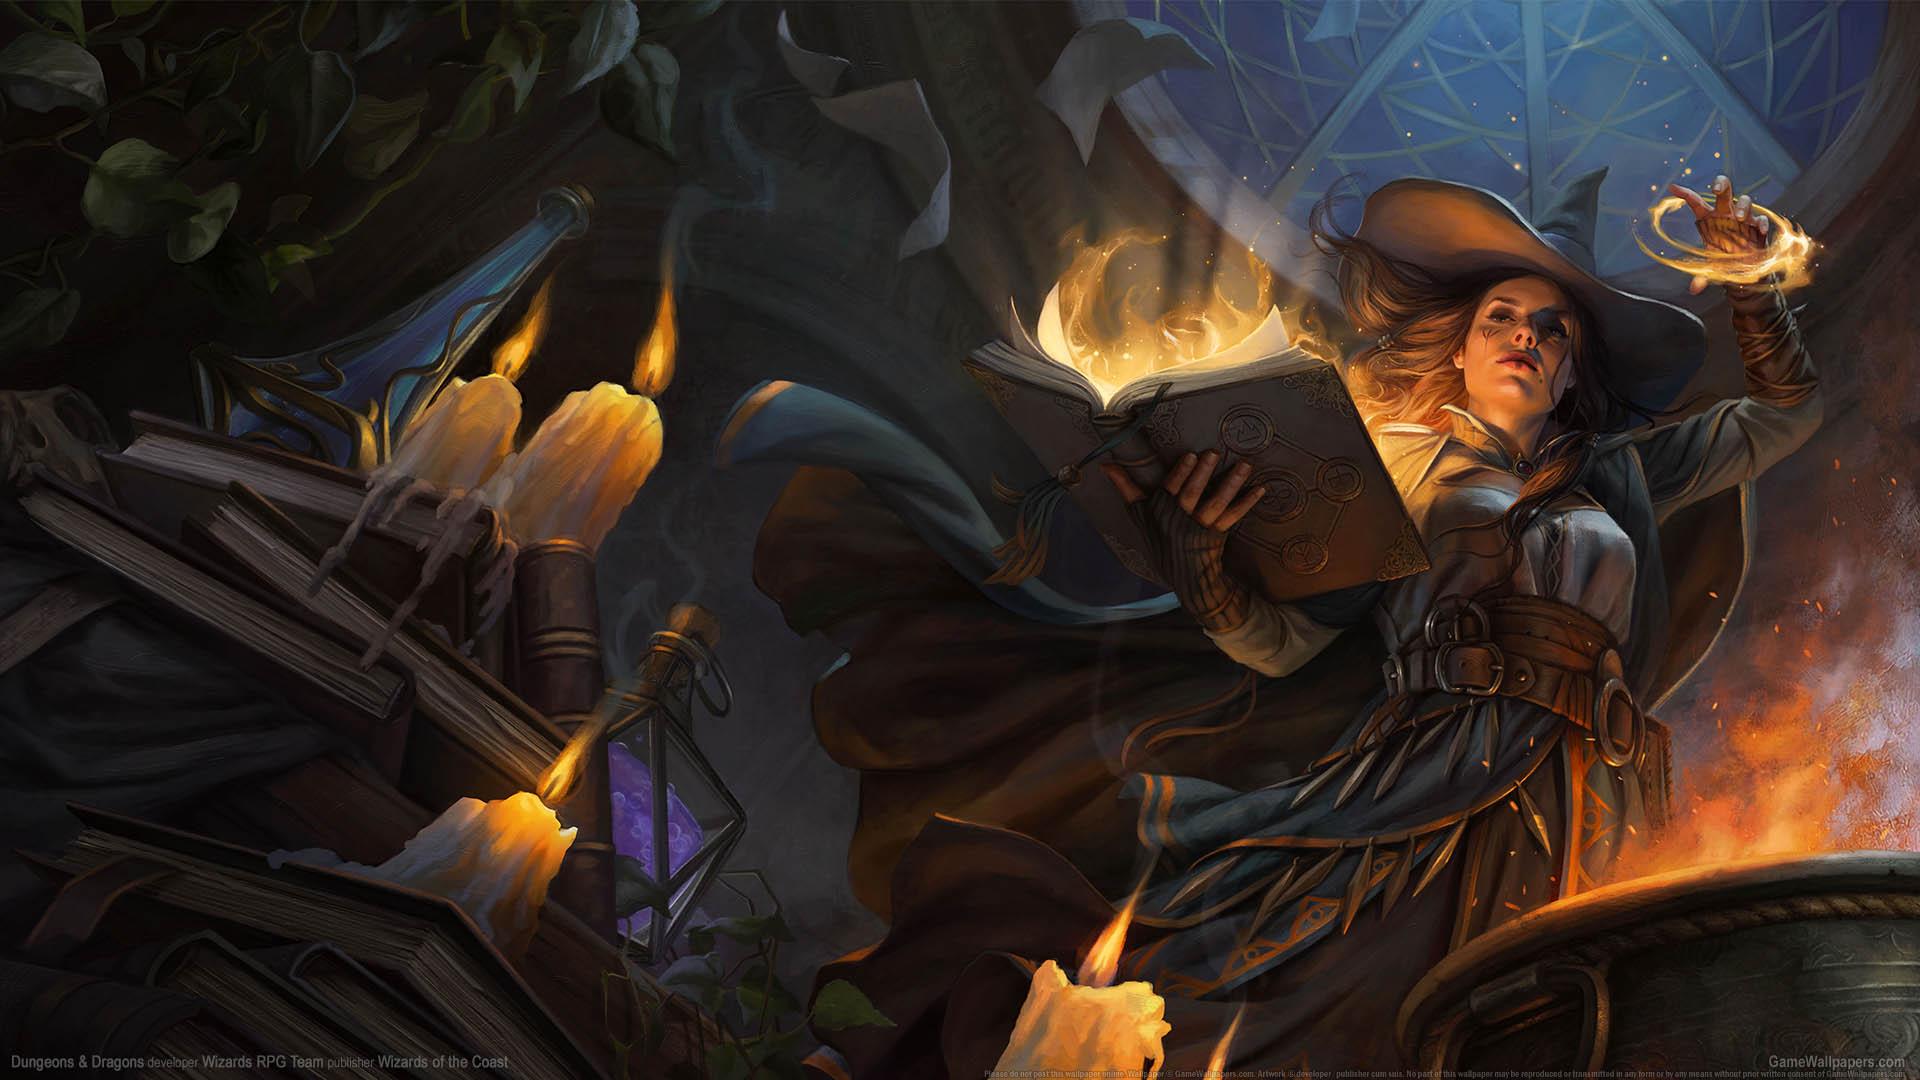 Dungeons & Dragons fond d'écran 01 1920x1080